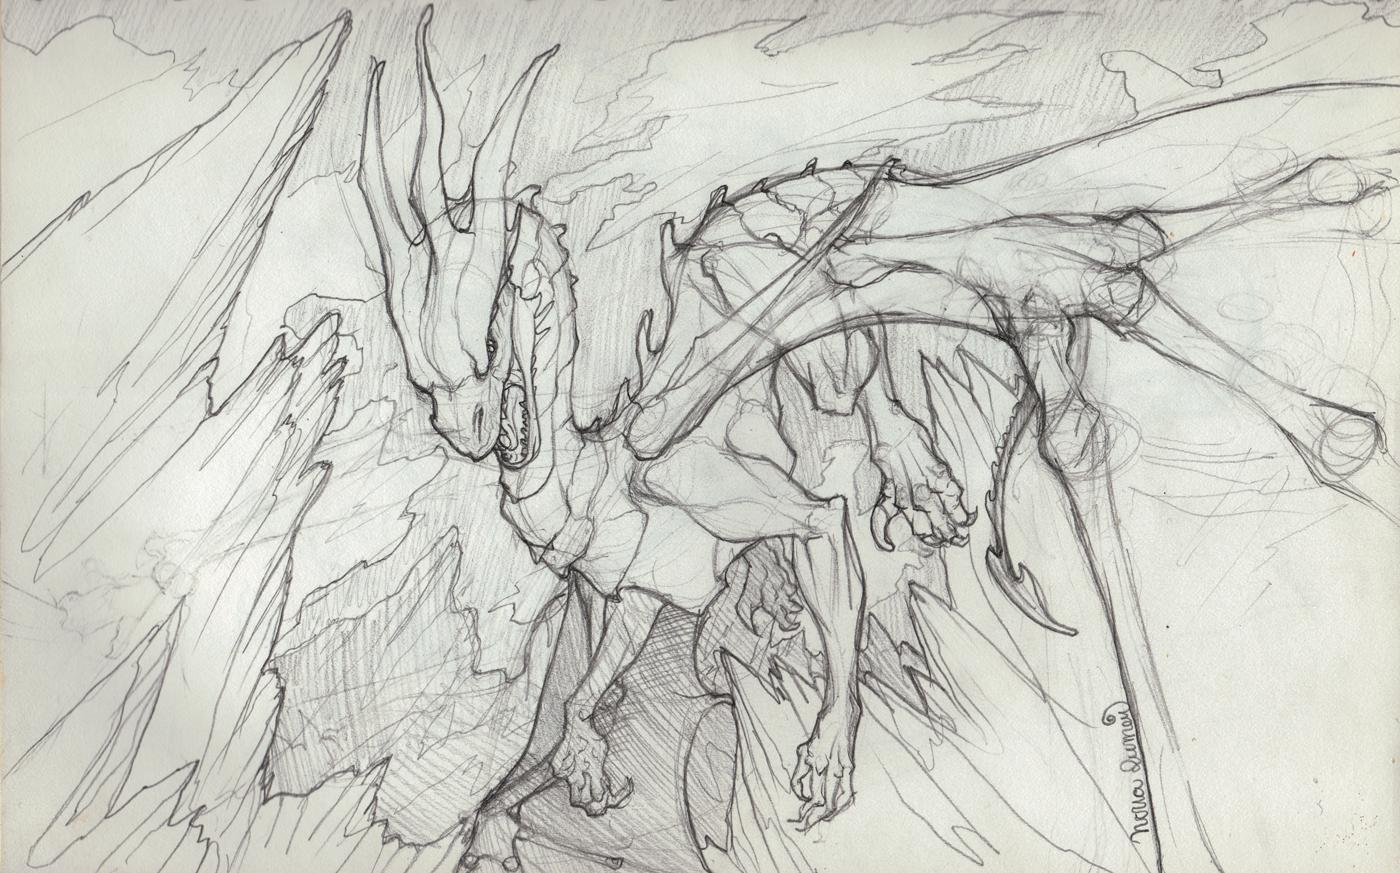 Dragon-Sketch-1-2017NB.png